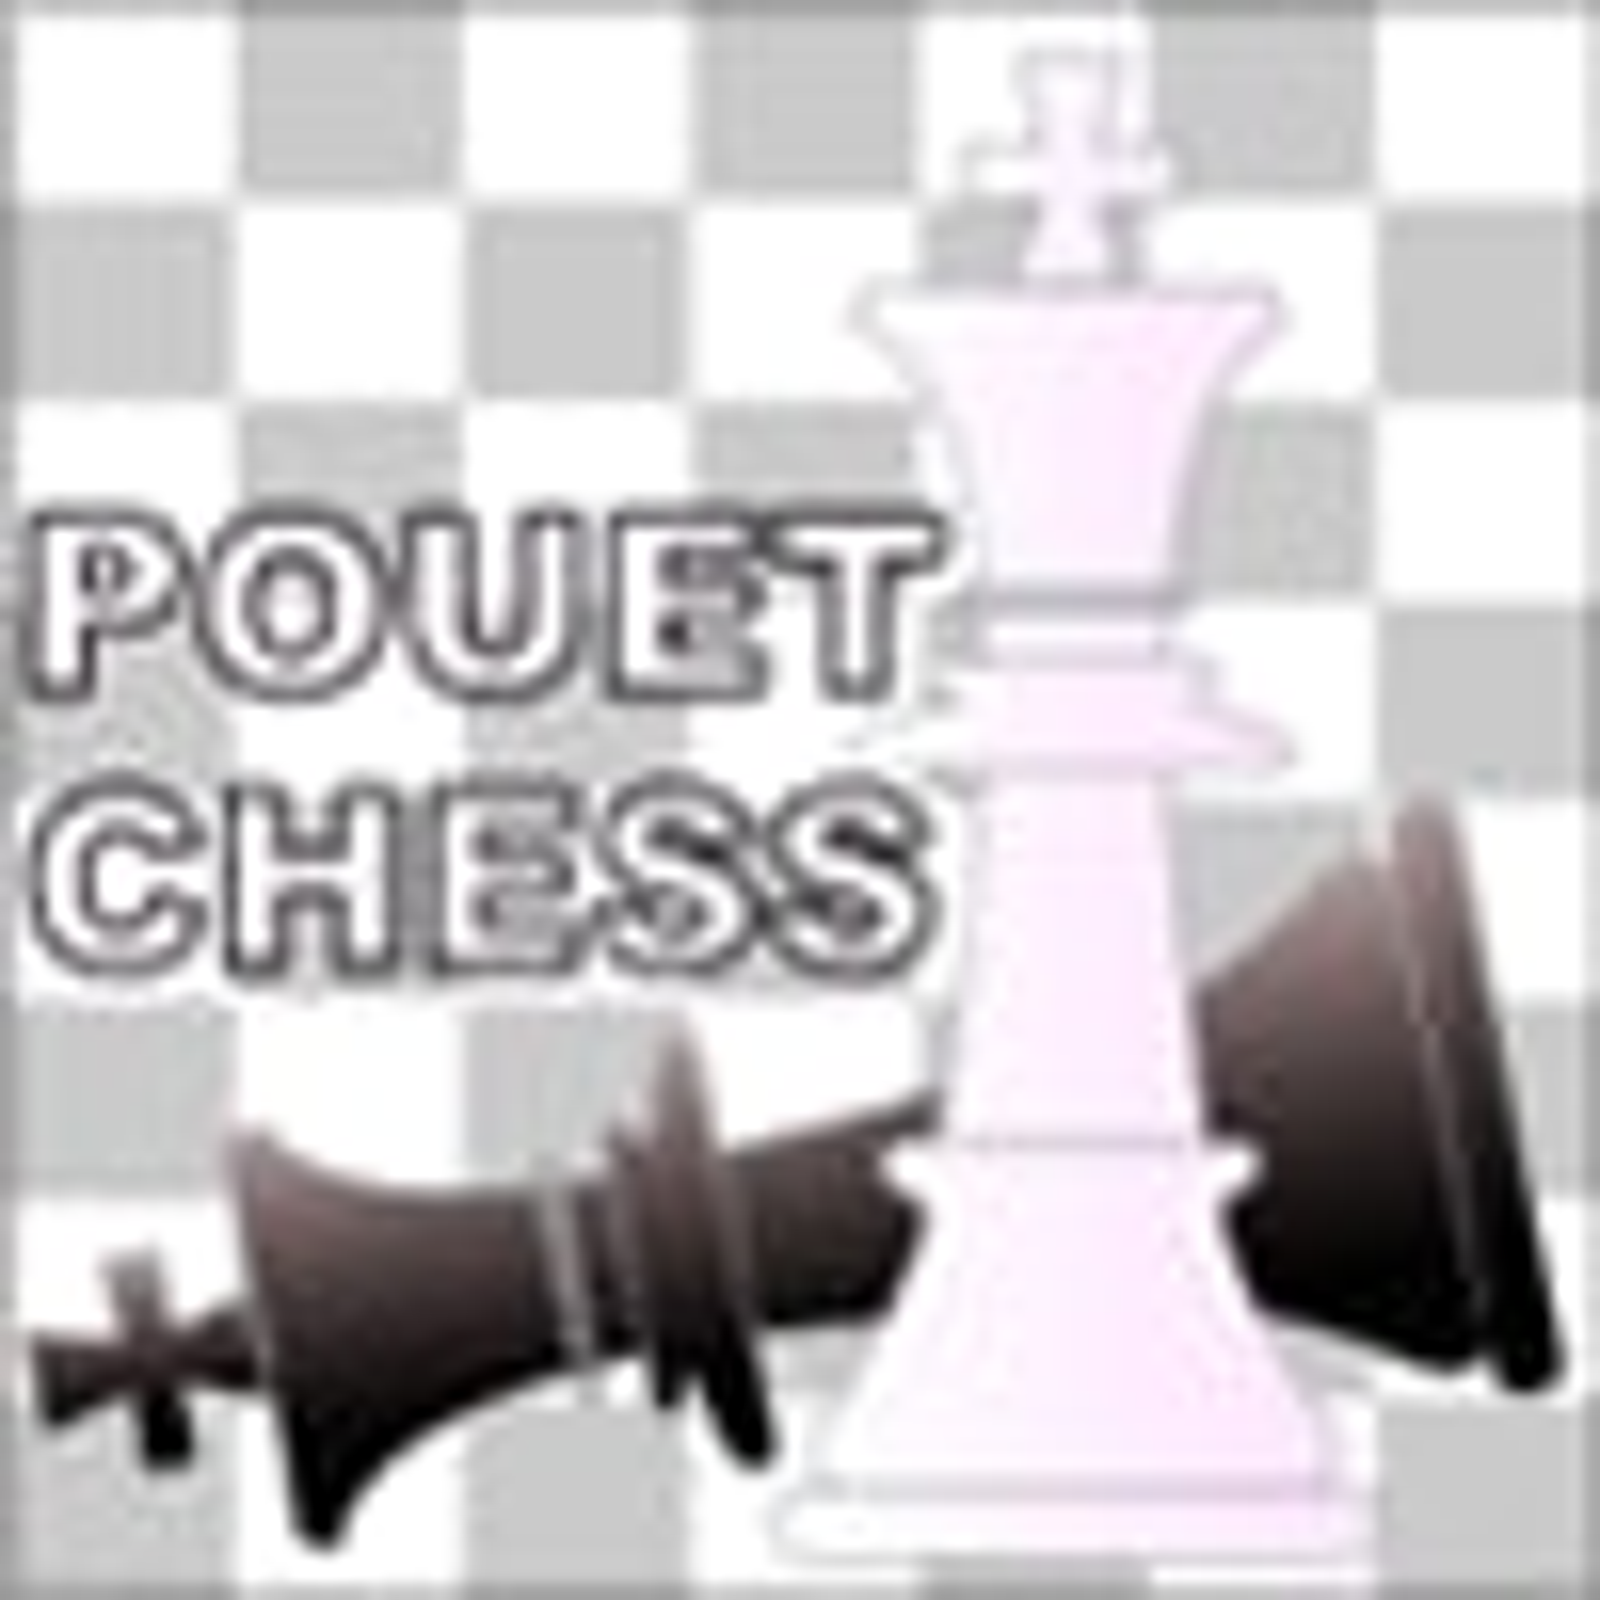 PouetChess